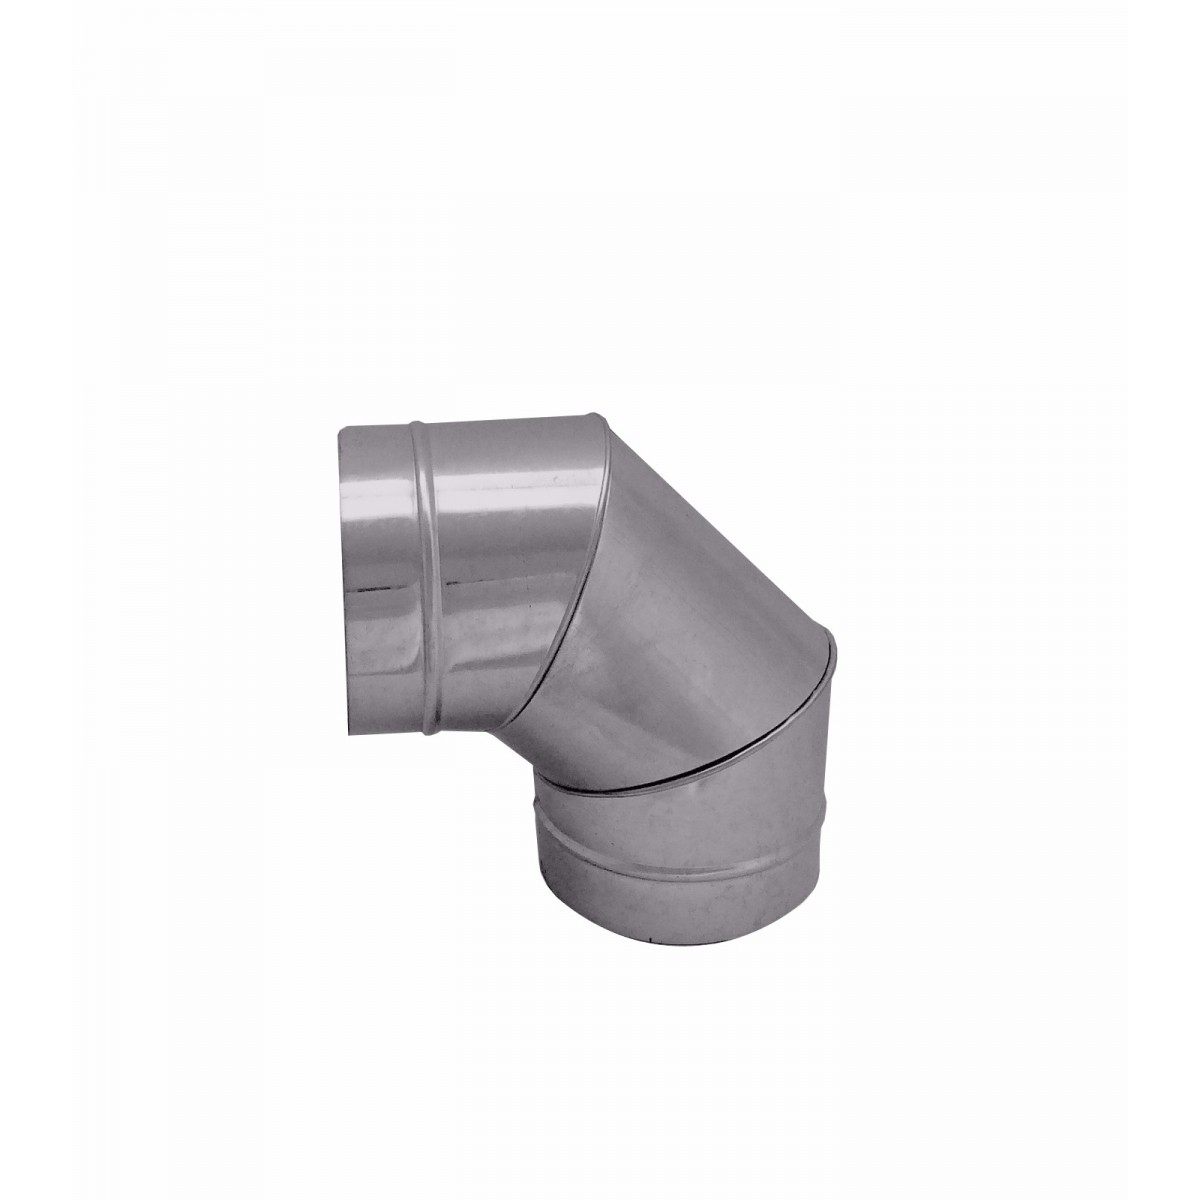 Curva / cotovelo galvanizada 90° de 230 mm de diâmetro  - Galvocalhas